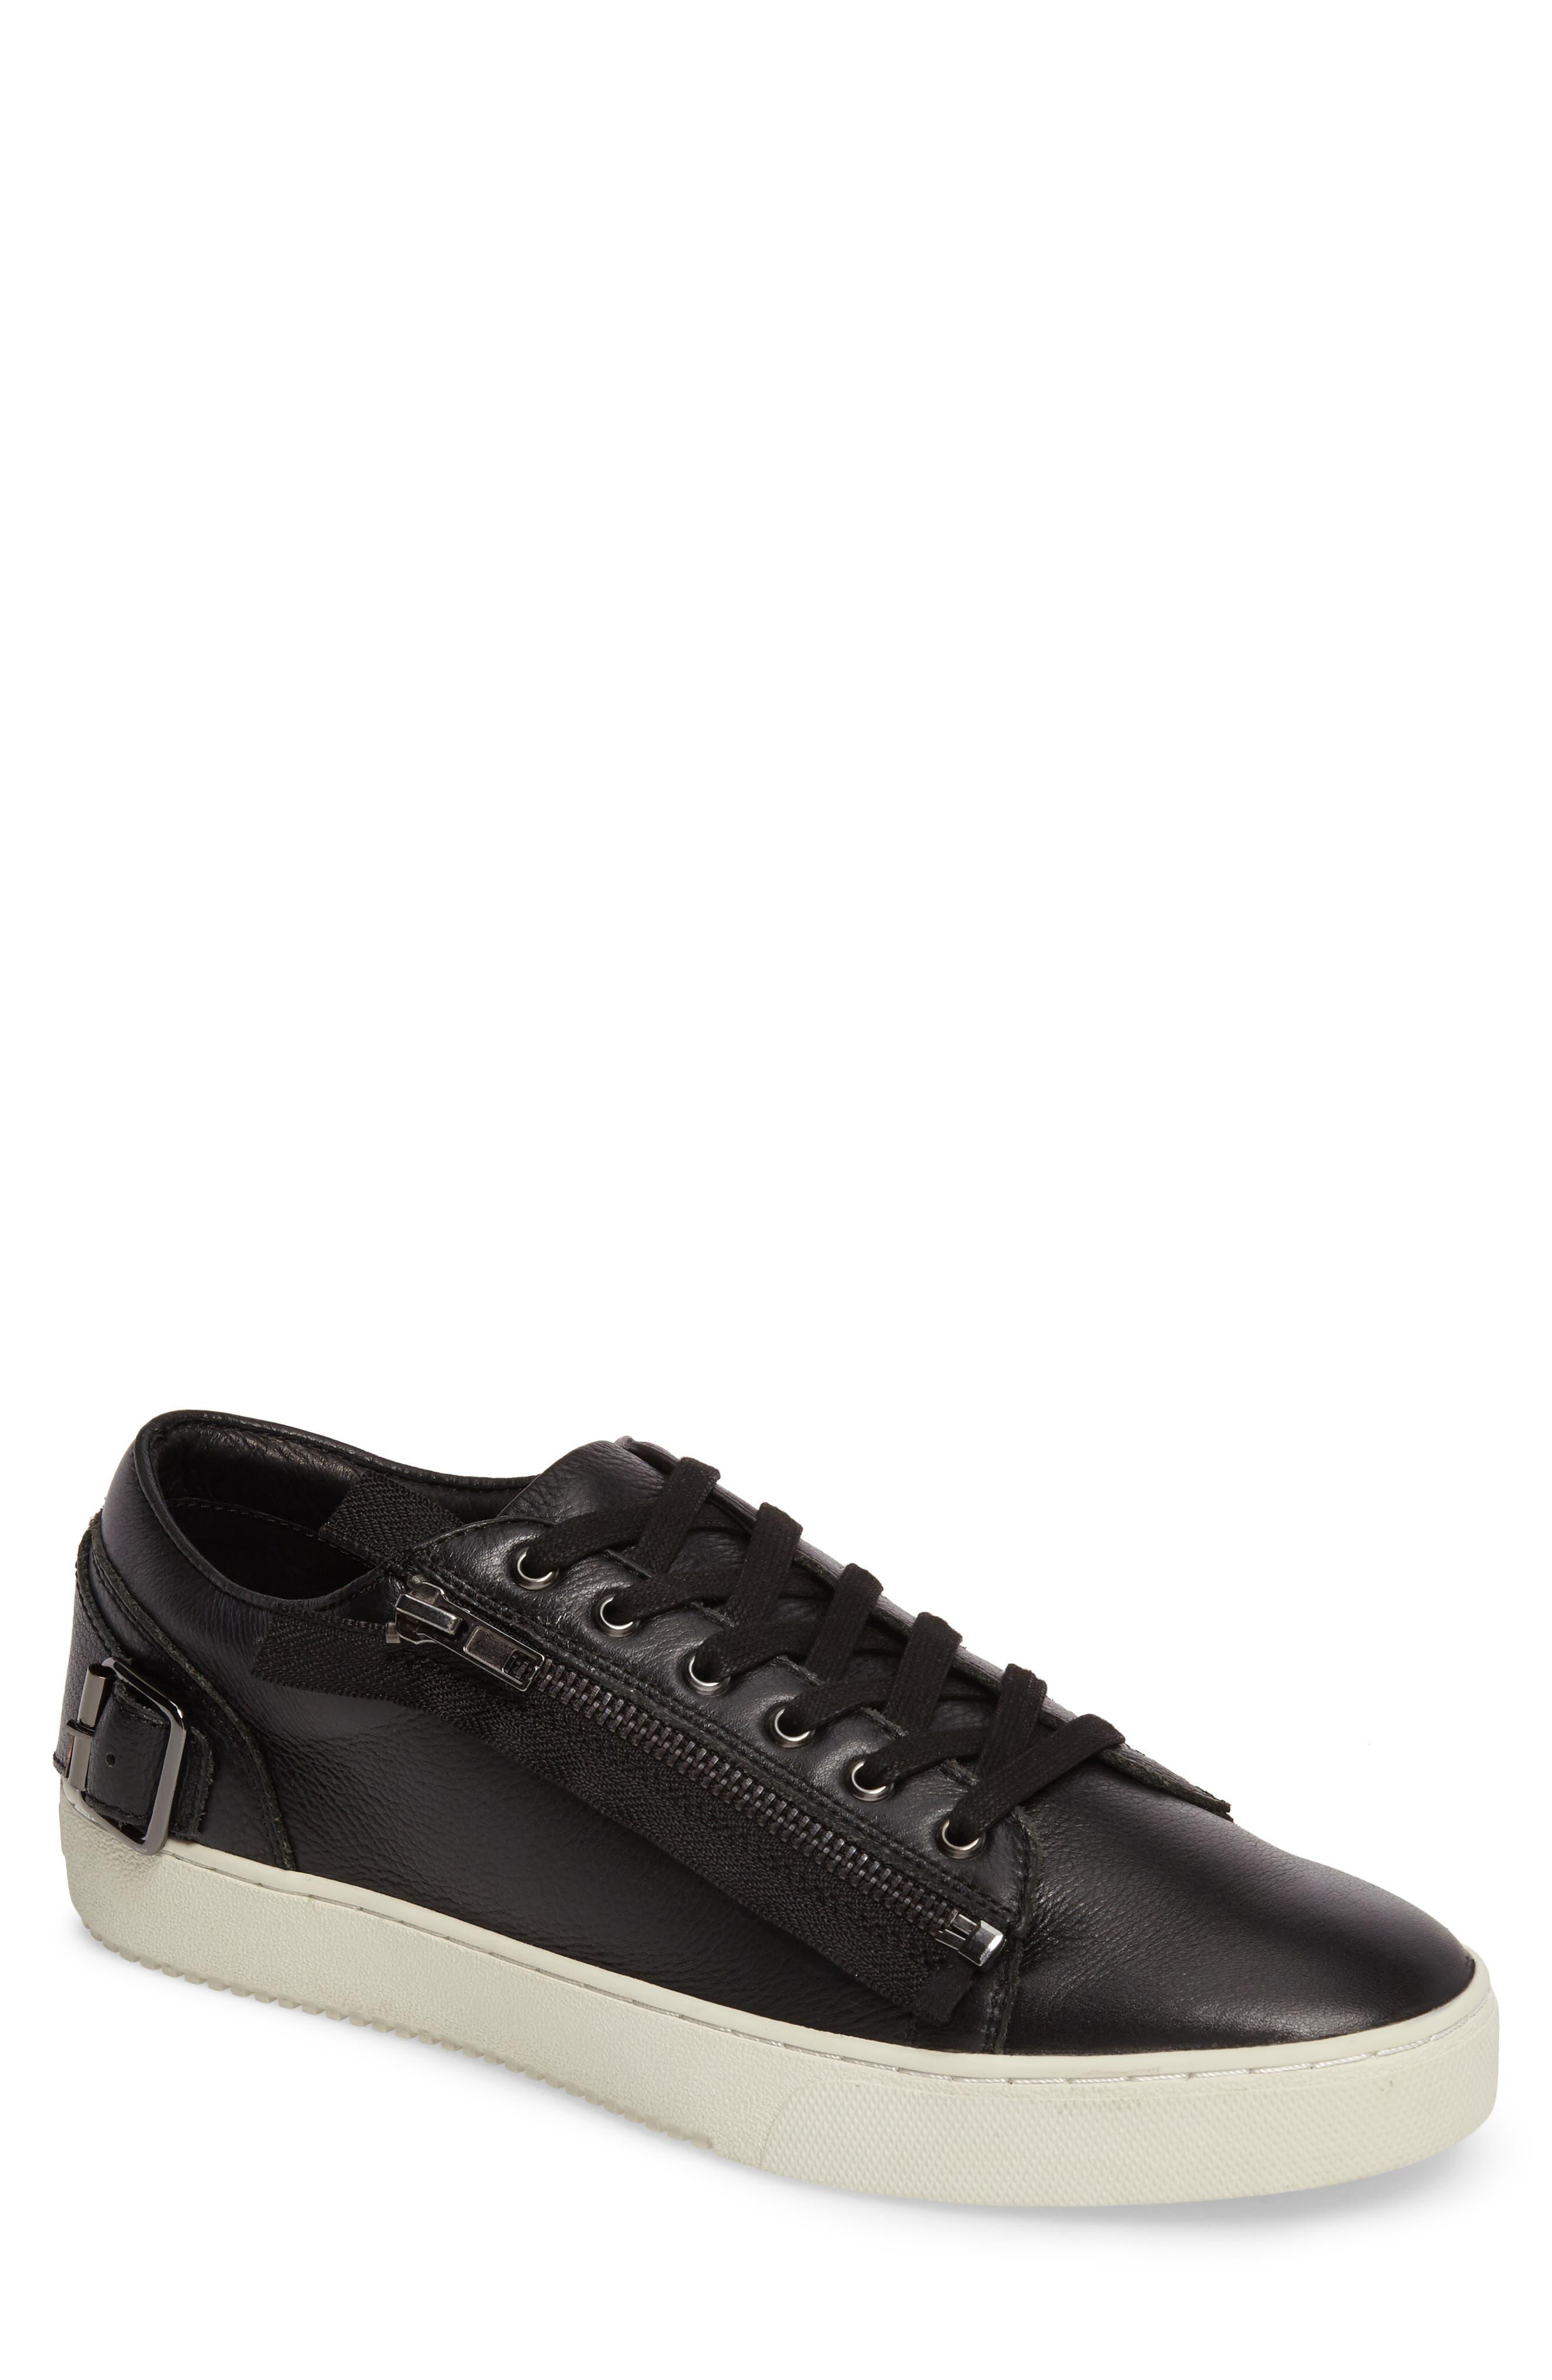 Wayne Sneaker,                             Main thumbnail 1, color,                             Black Leather